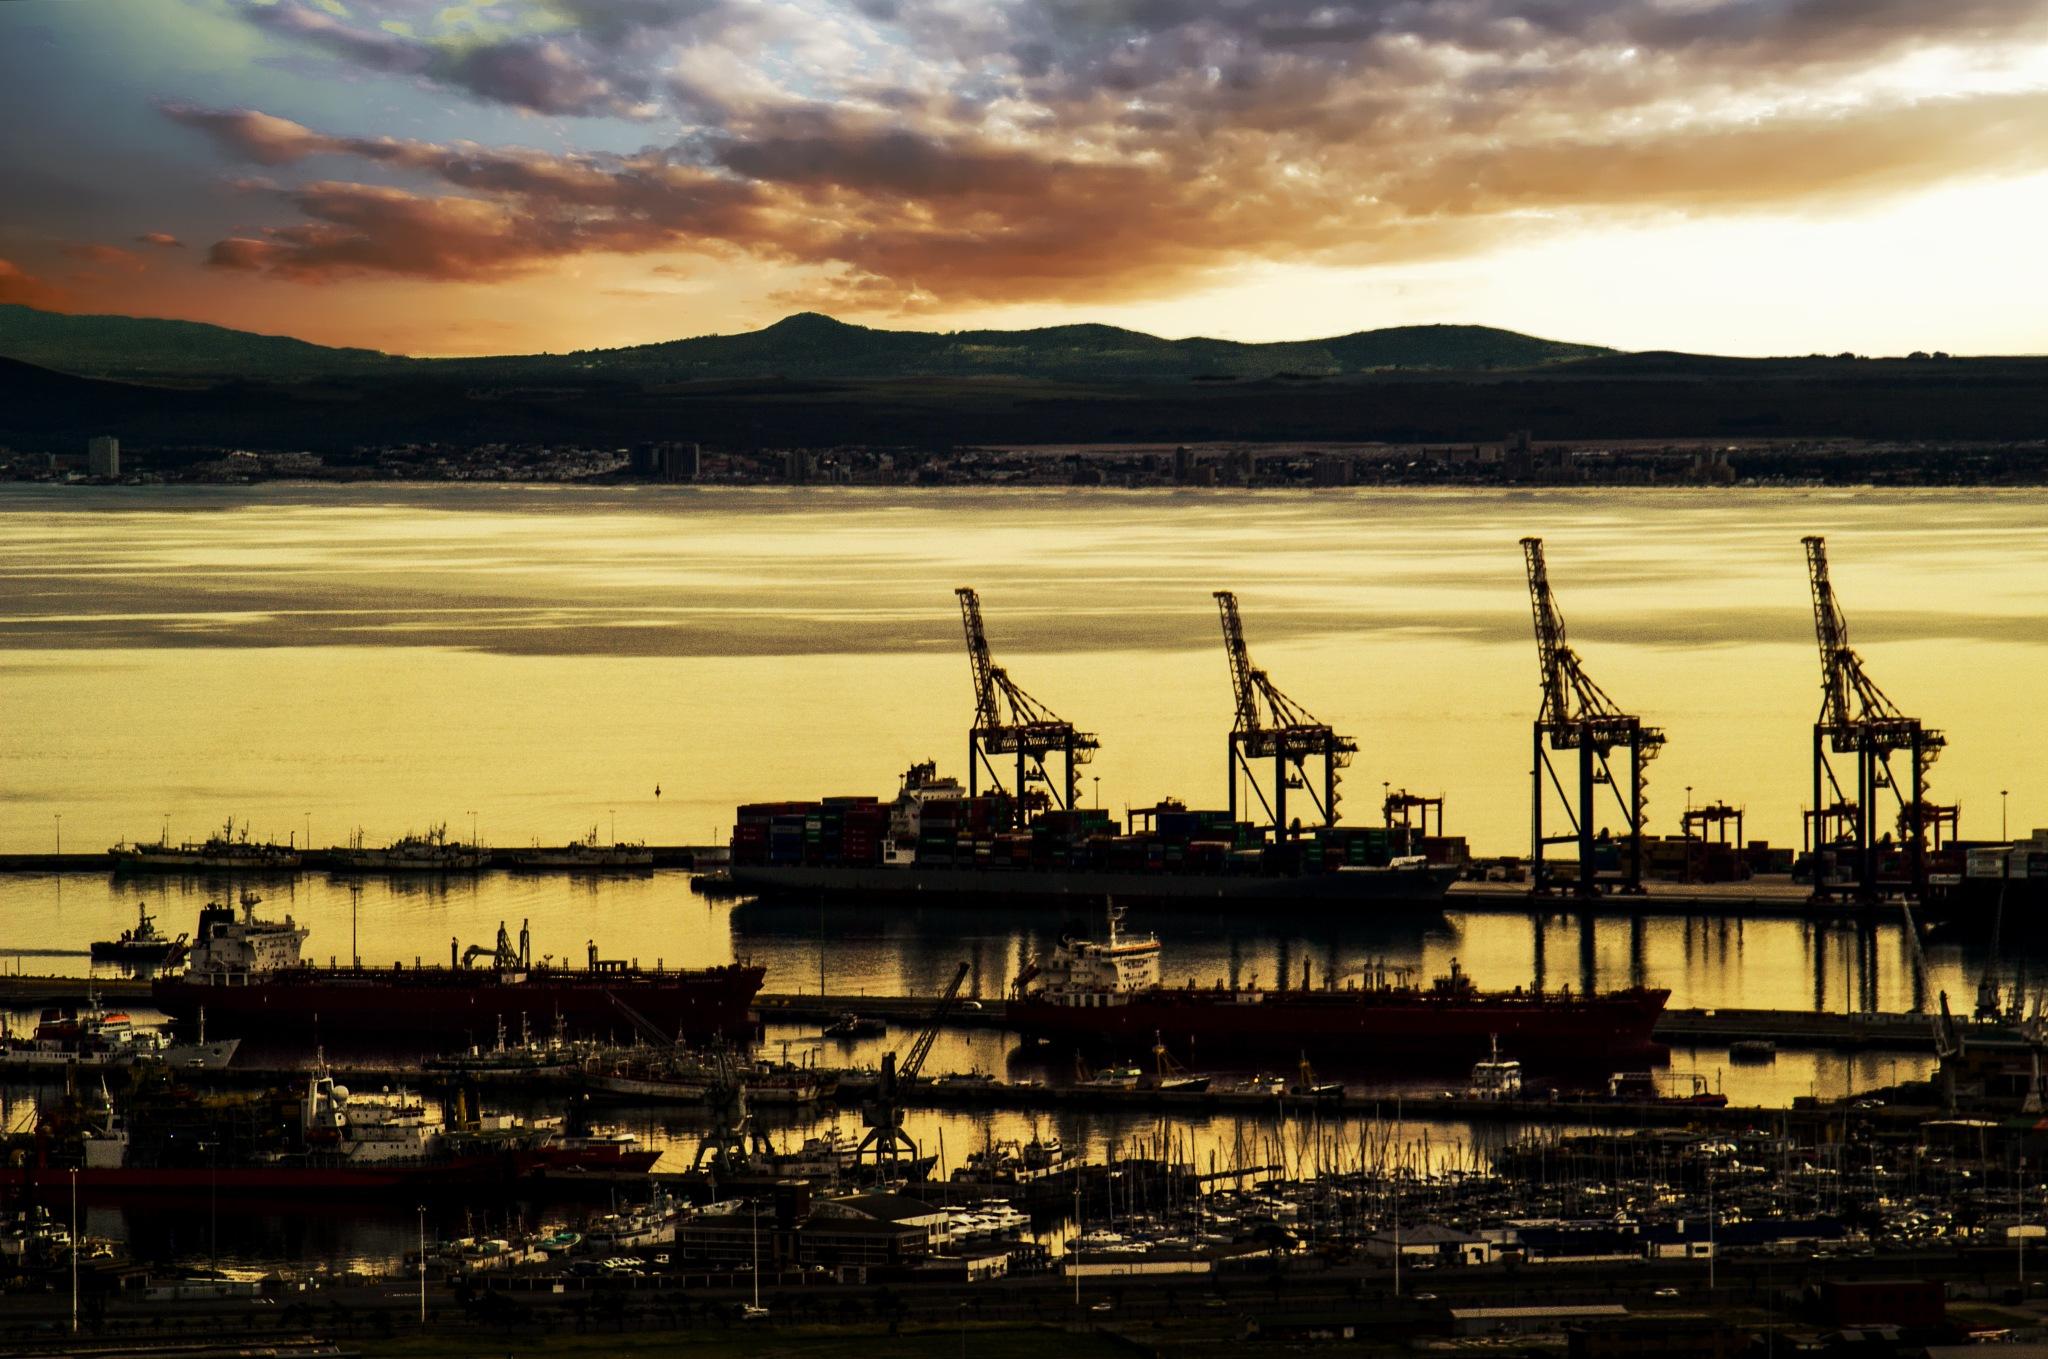 Harbour in silhouette by Nauta Piscatorque